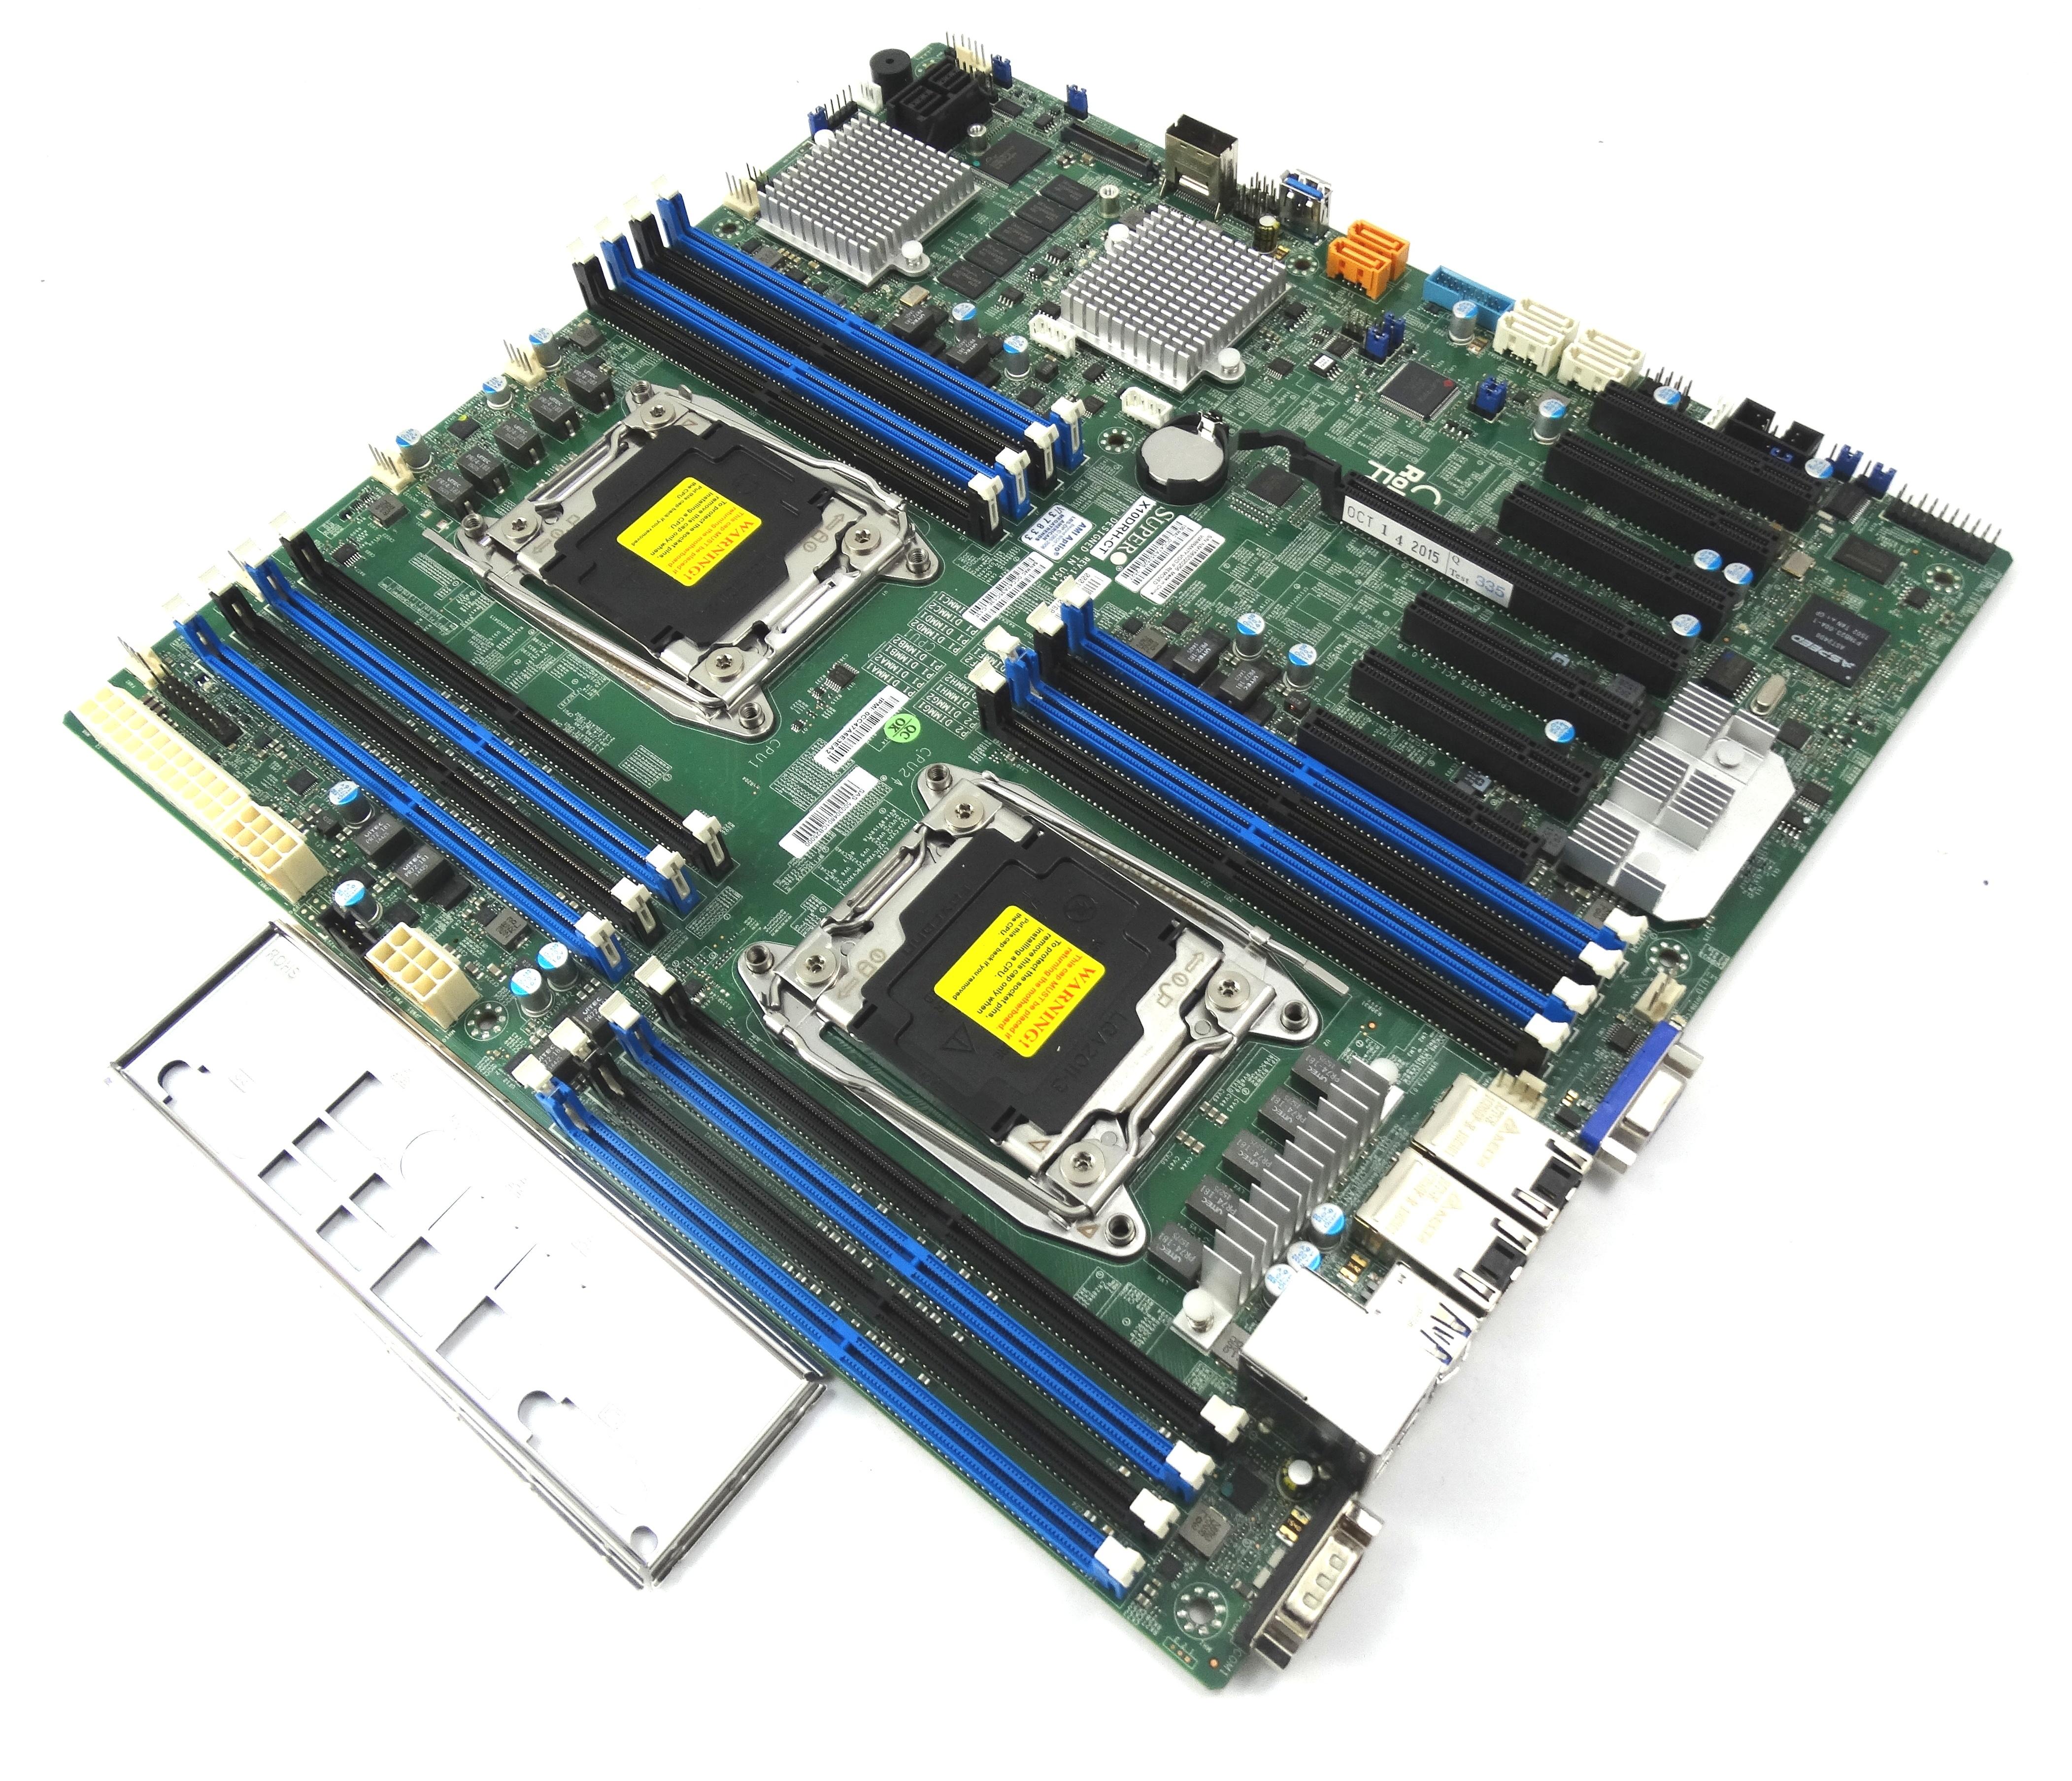 Supermicro Dual LGA2011-V3 Socket DDR4 E-Atx Motherboard (X10DRH-CT)